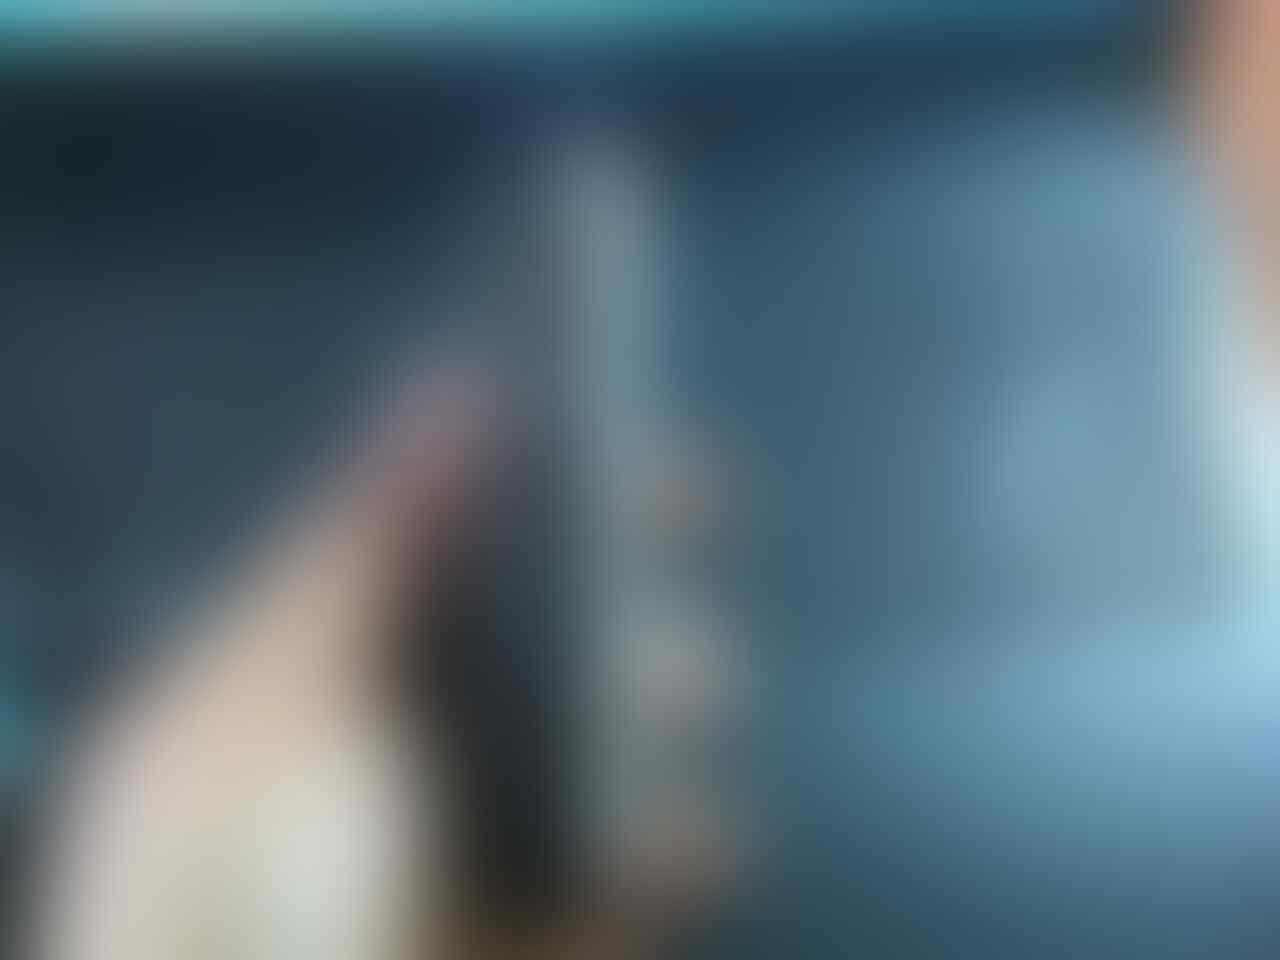 JUAL BLACKBERRY PEARL 8230 CDMA BANDUNG